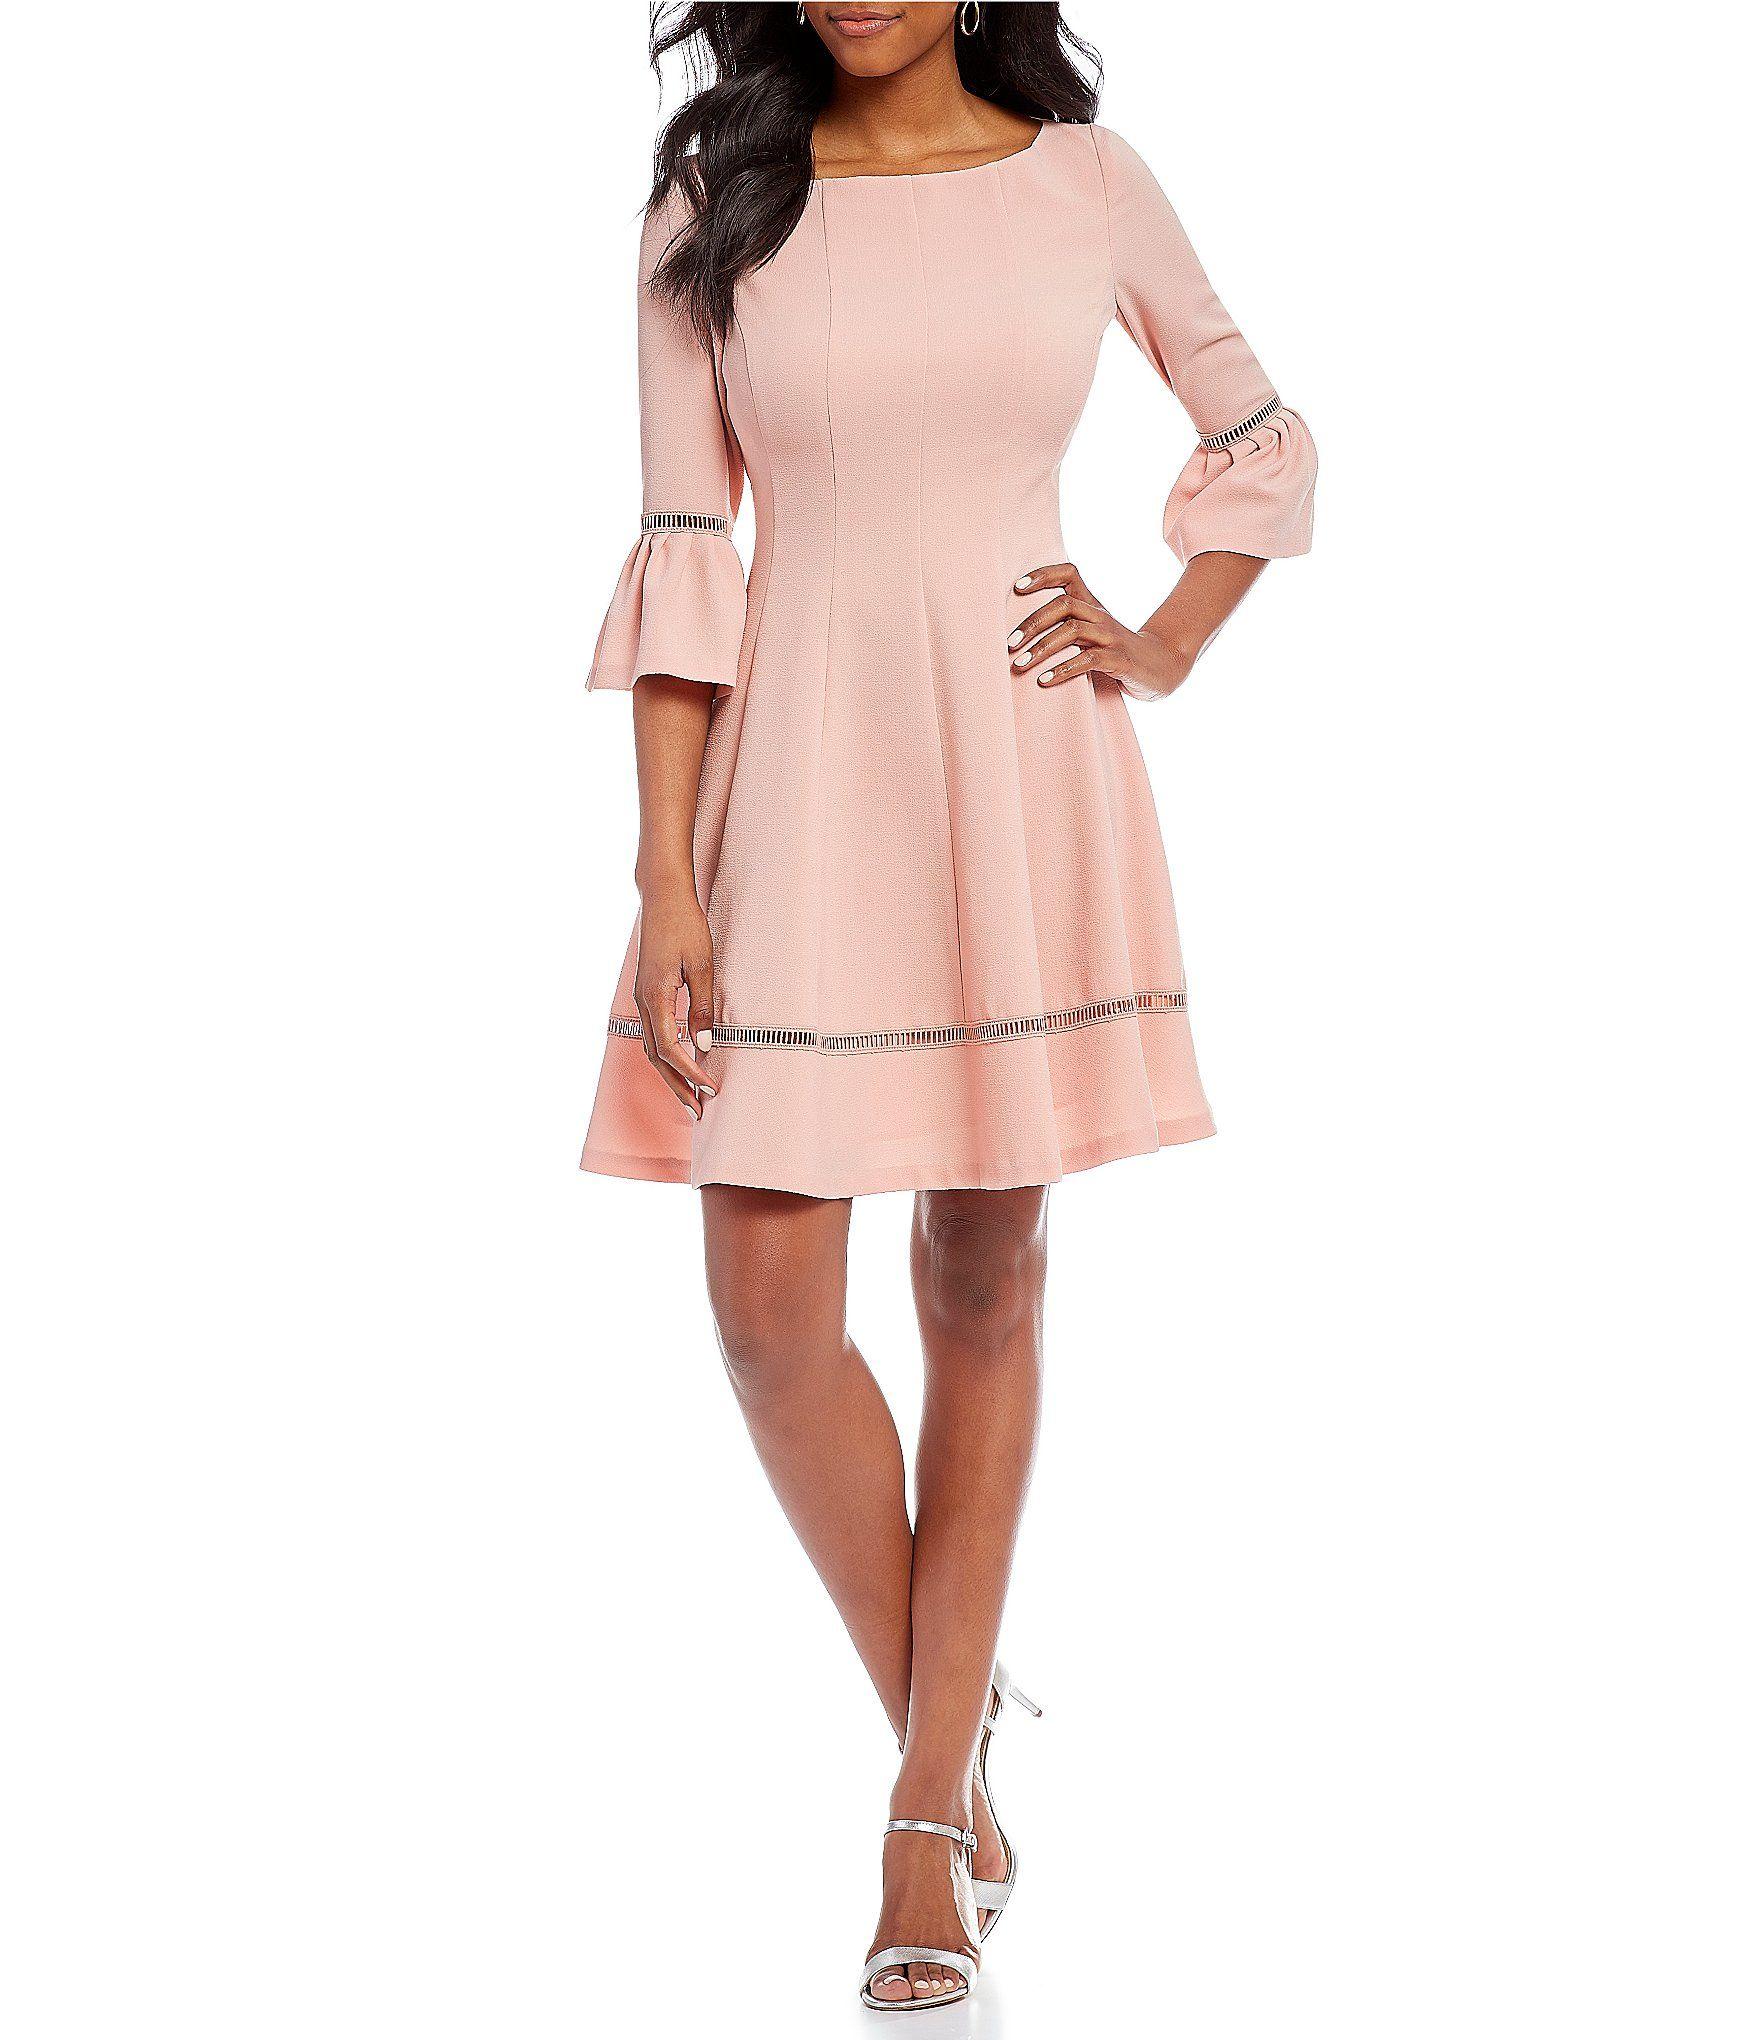 378bc7d3e86 Eliza J Cutout Lattice Trim Bell Sleeve Fit and Flare Dress ...